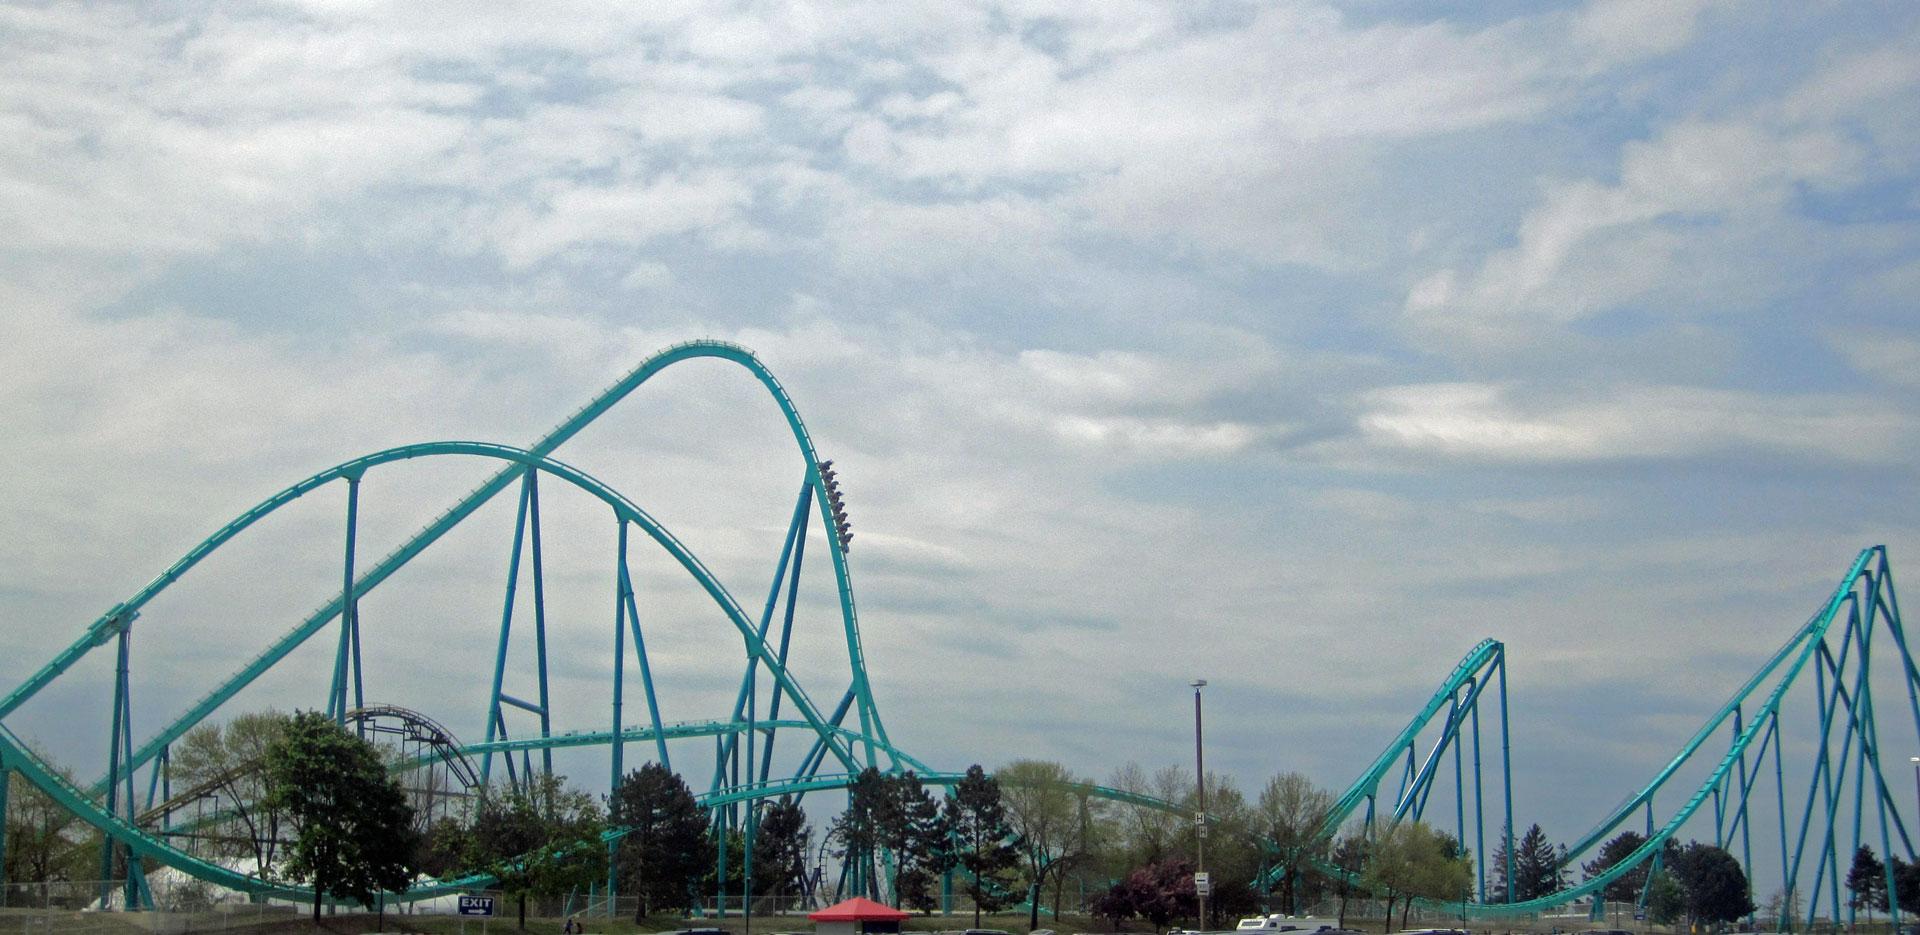 leviathan roller coaster - HD1920×935